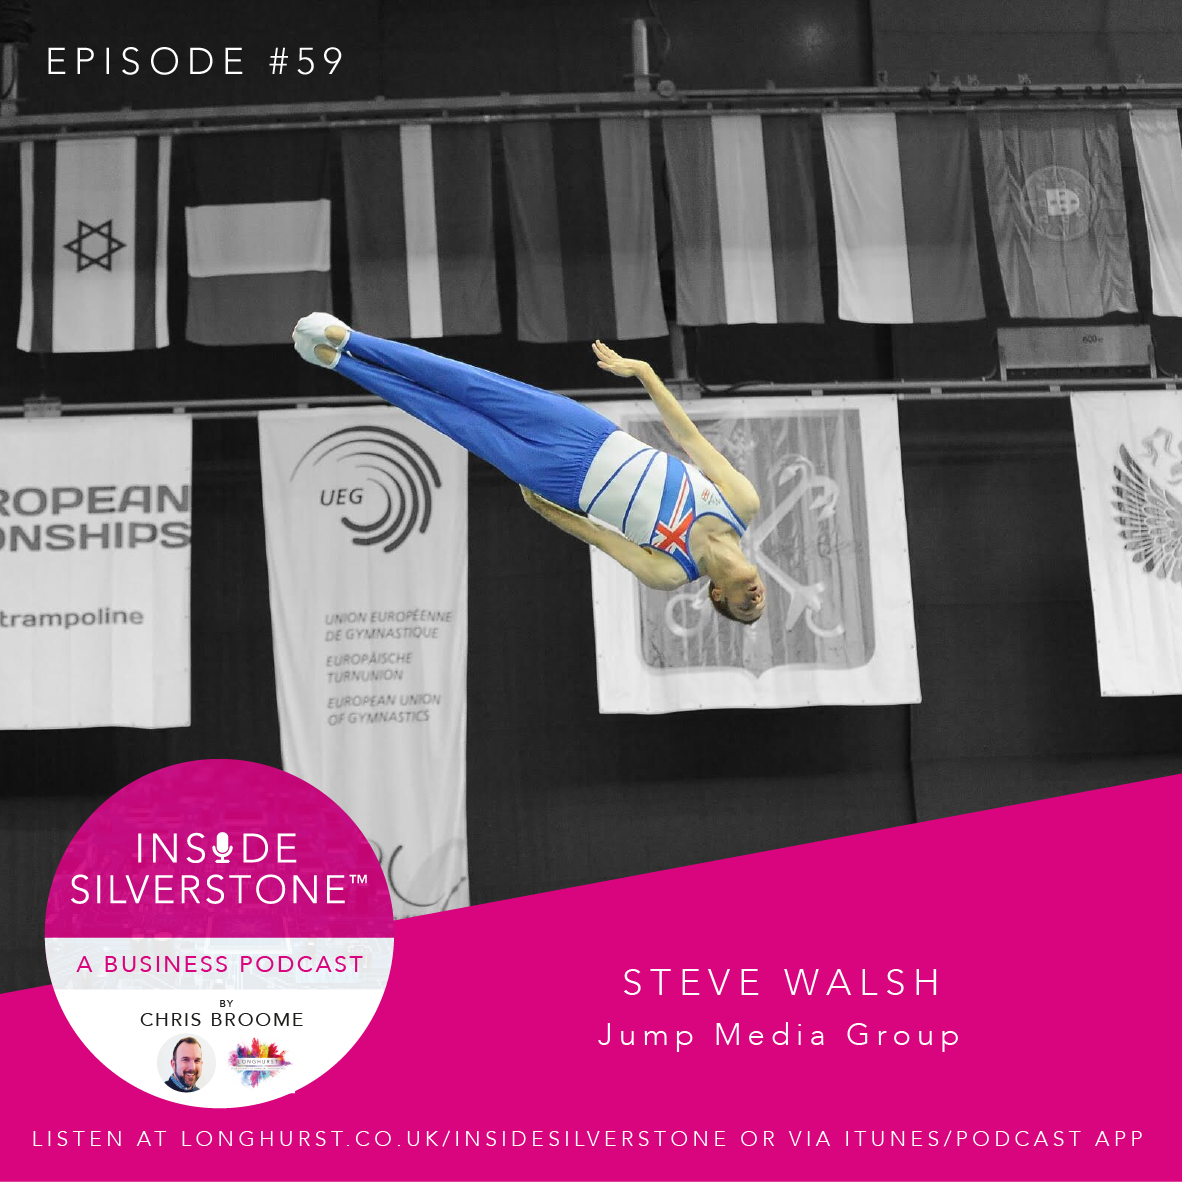 Steve Walsh of Jump Media Group